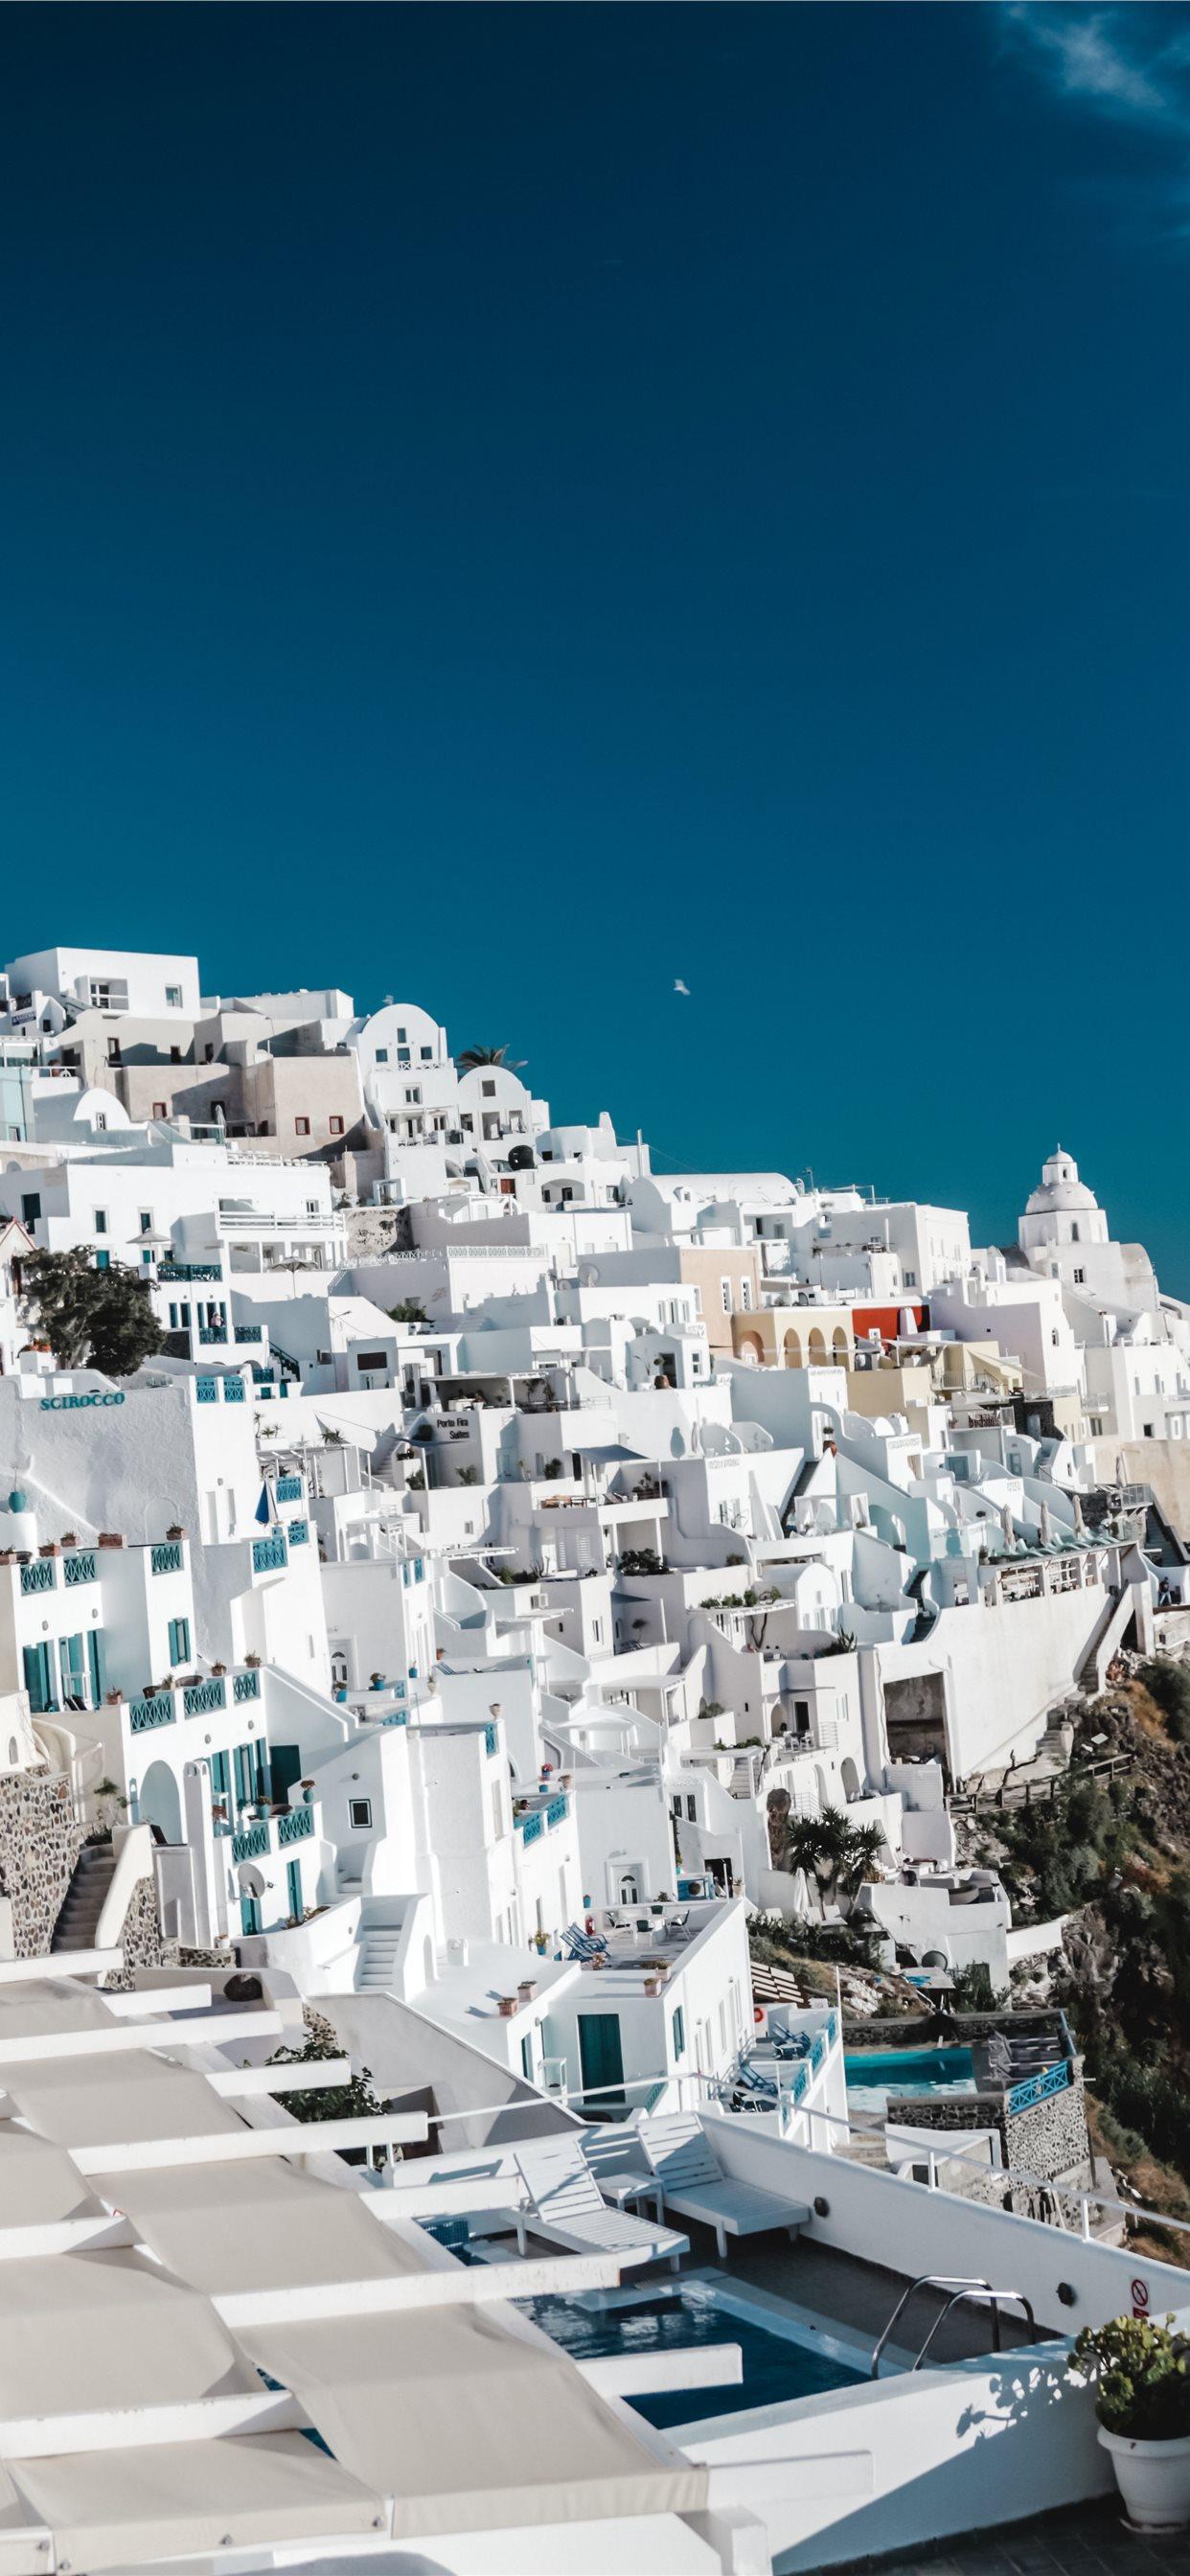 Santorini Greece View Travel Blog Iphone X Wallpapers Free Download